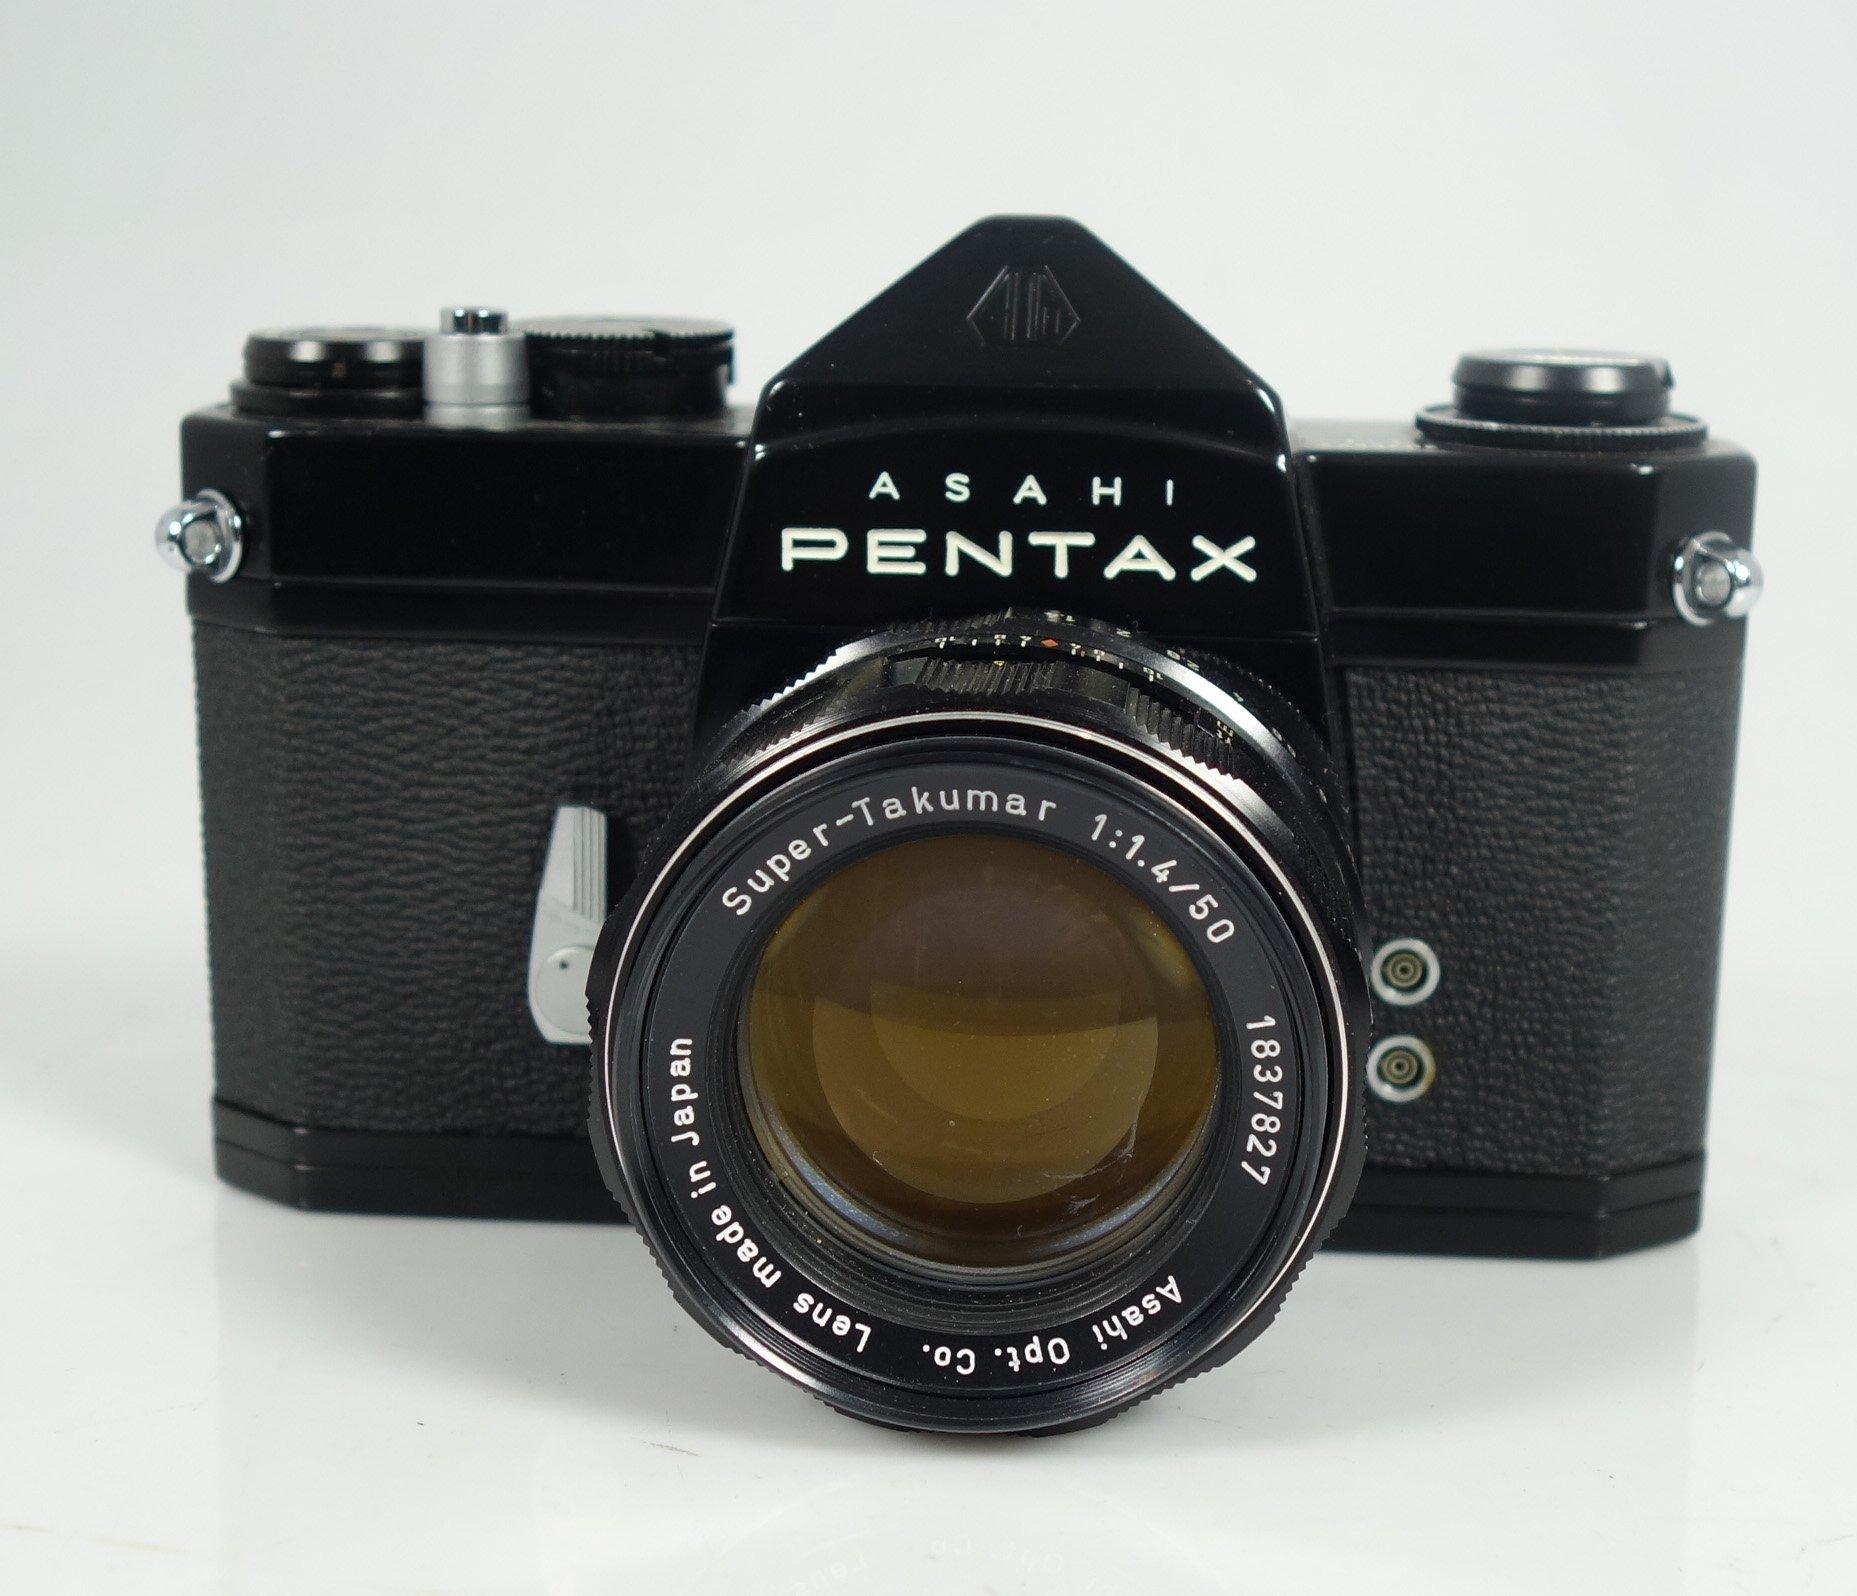 asahi pentax spiegelreflexkamera sl super takumar 1 1 4 50 lens ebay. Black Bedroom Furniture Sets. Home Design Ideas